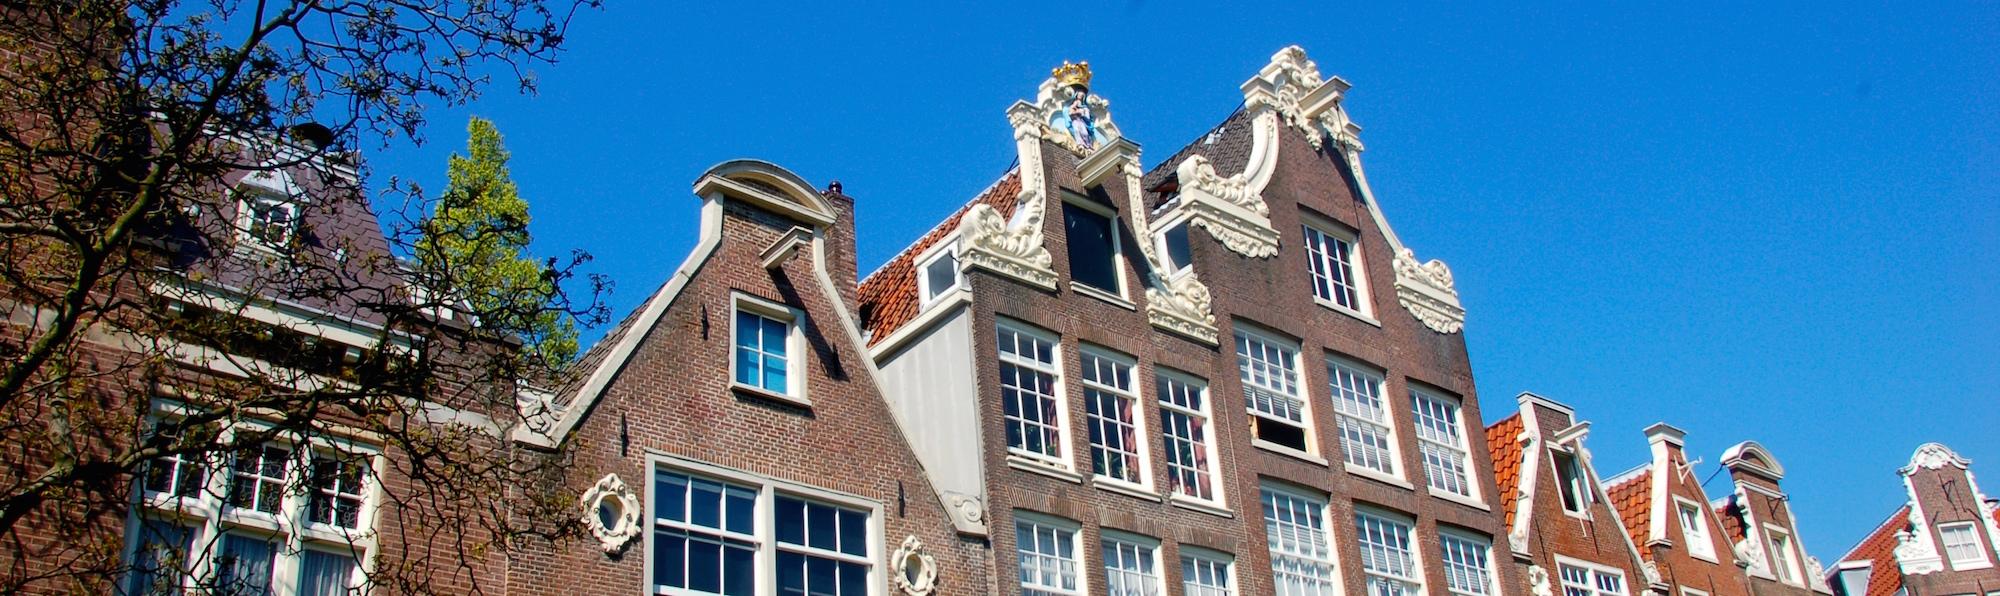 Camino plaza Spui, Ámsterdam